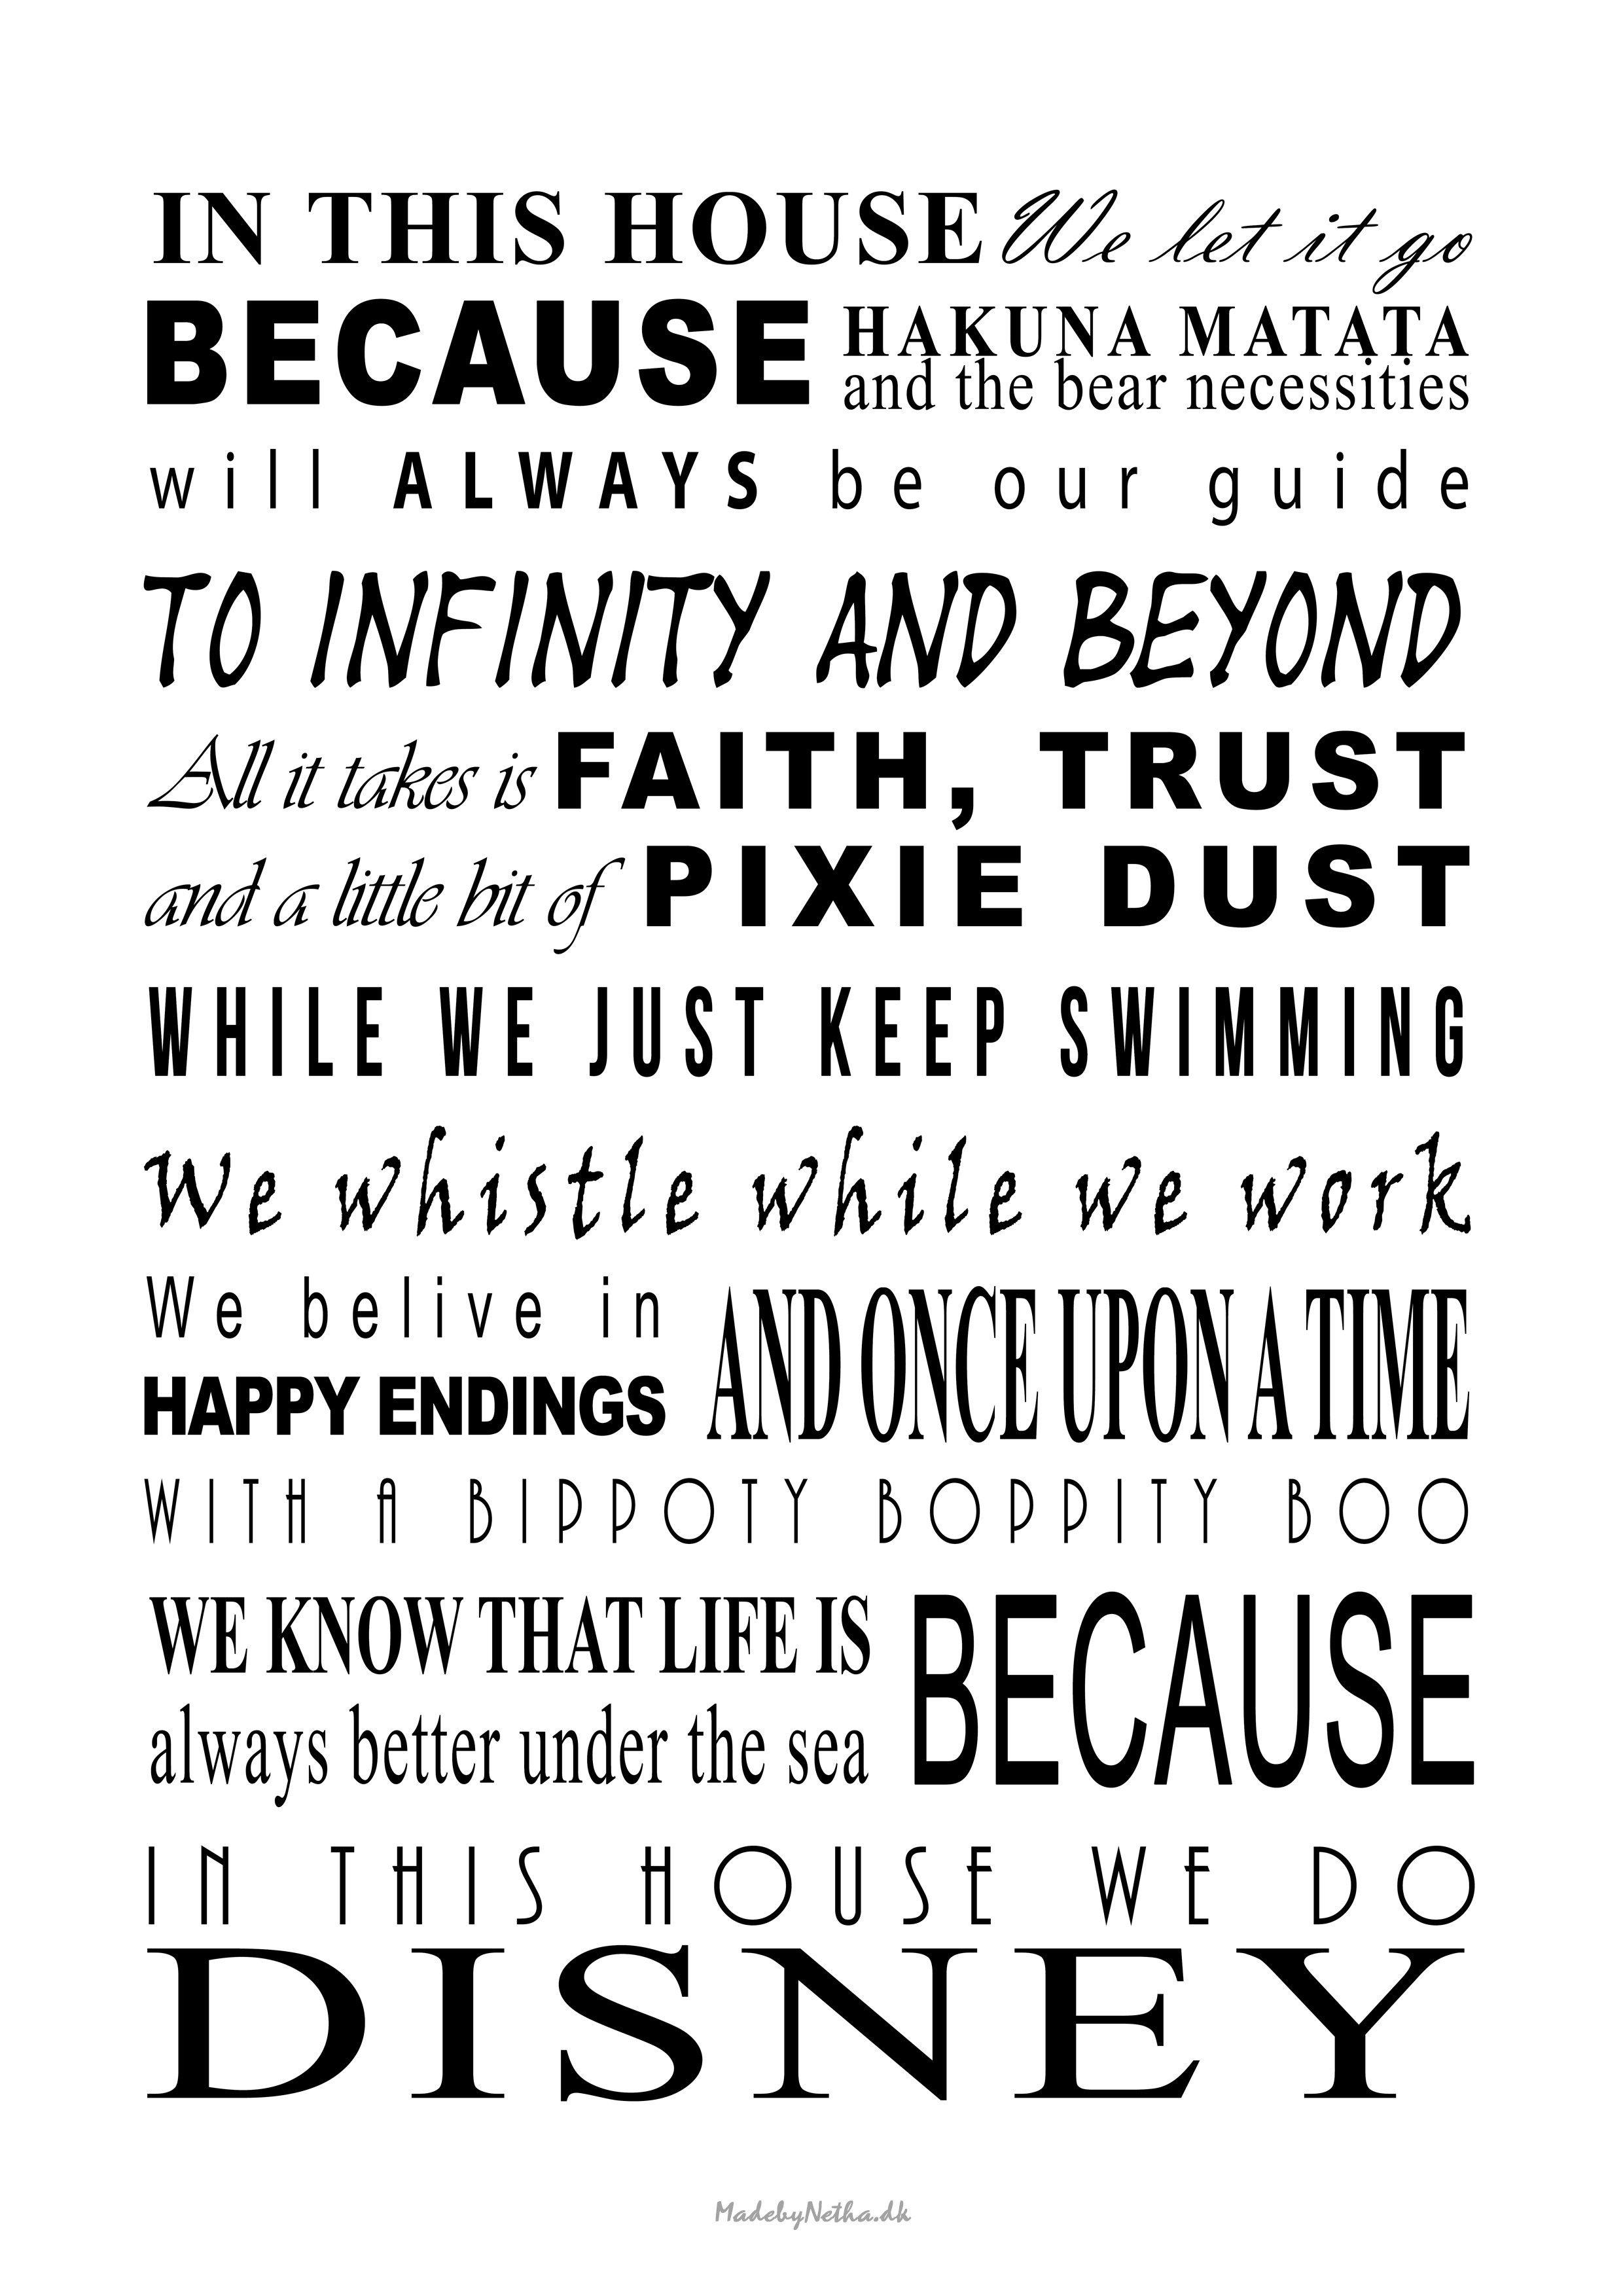 Free Printable Poster In This House We Do Disney Madebynetha Citater Guddommelige Citater Gratis Download